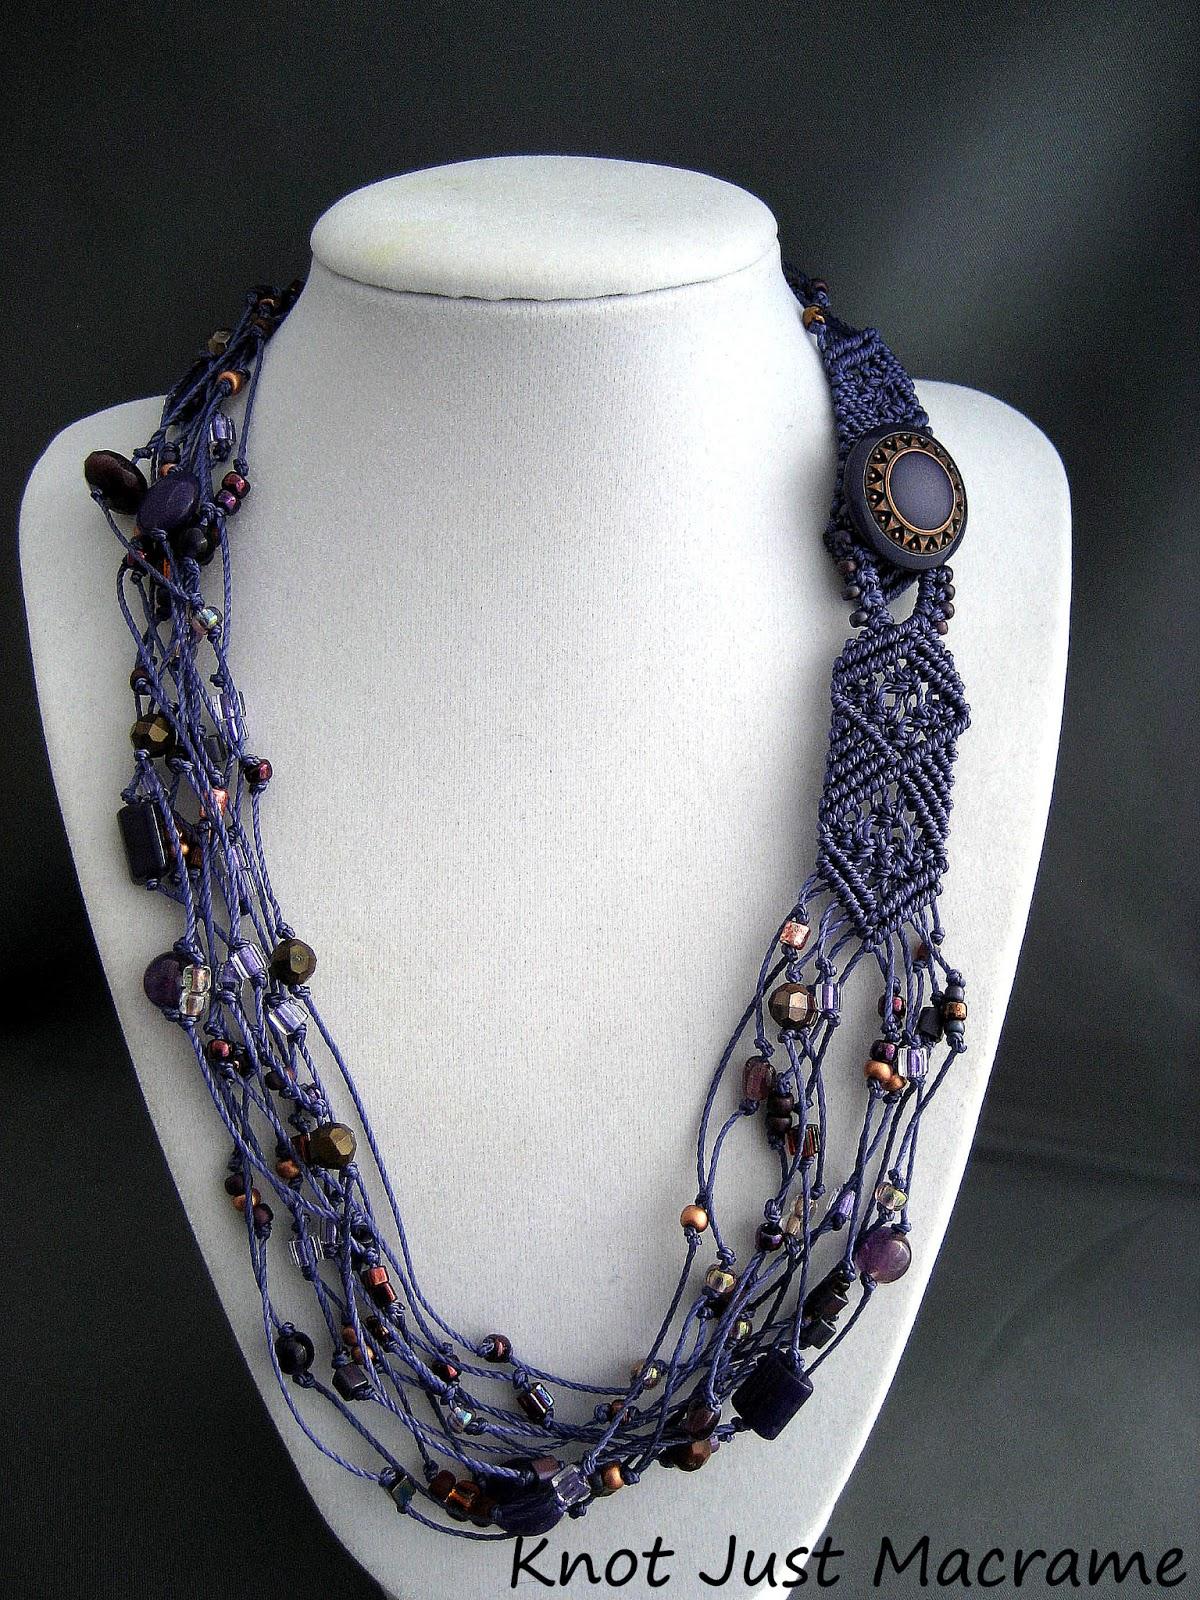 Knot Just Macrame by Sherri Stokey: Beaded Macrame Necklaces